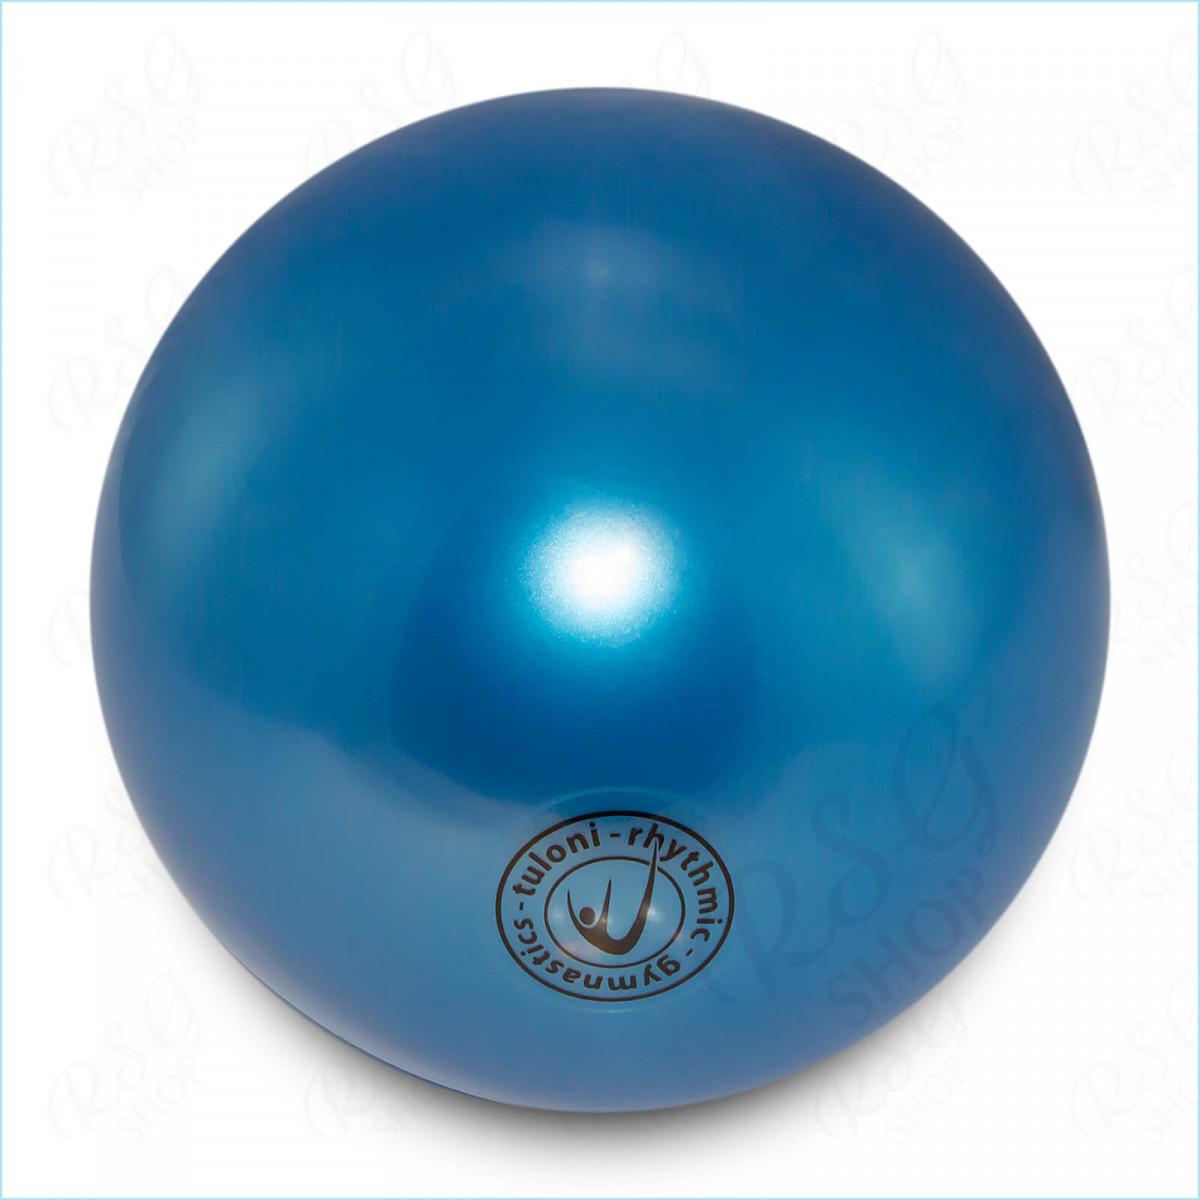 Голографический (high vision) мяч